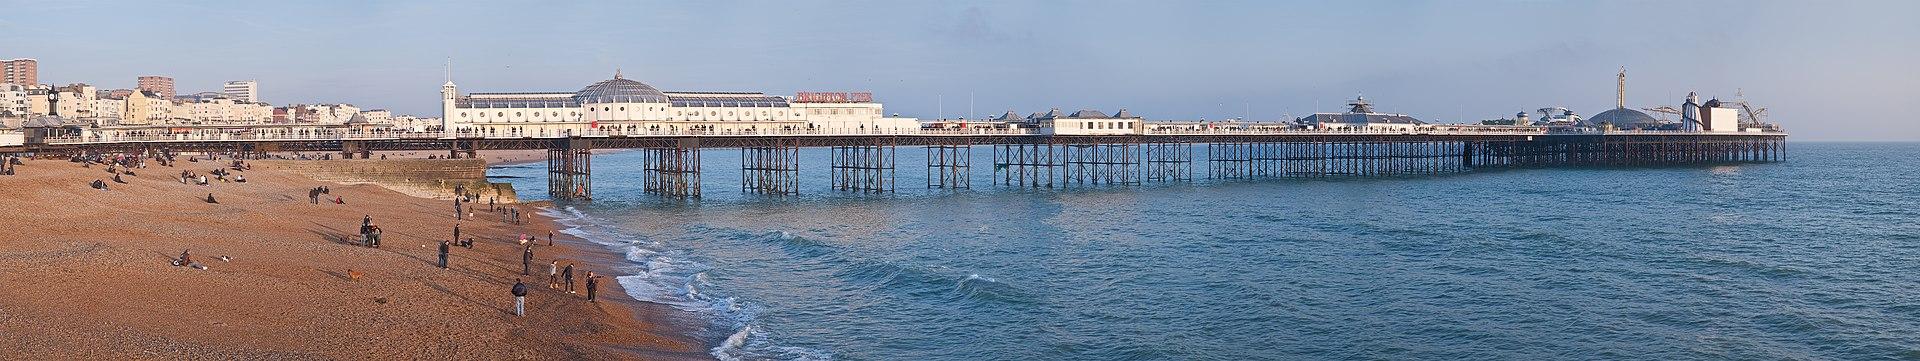 1920px-Brighton_Pier,_England_-_Feb_2009